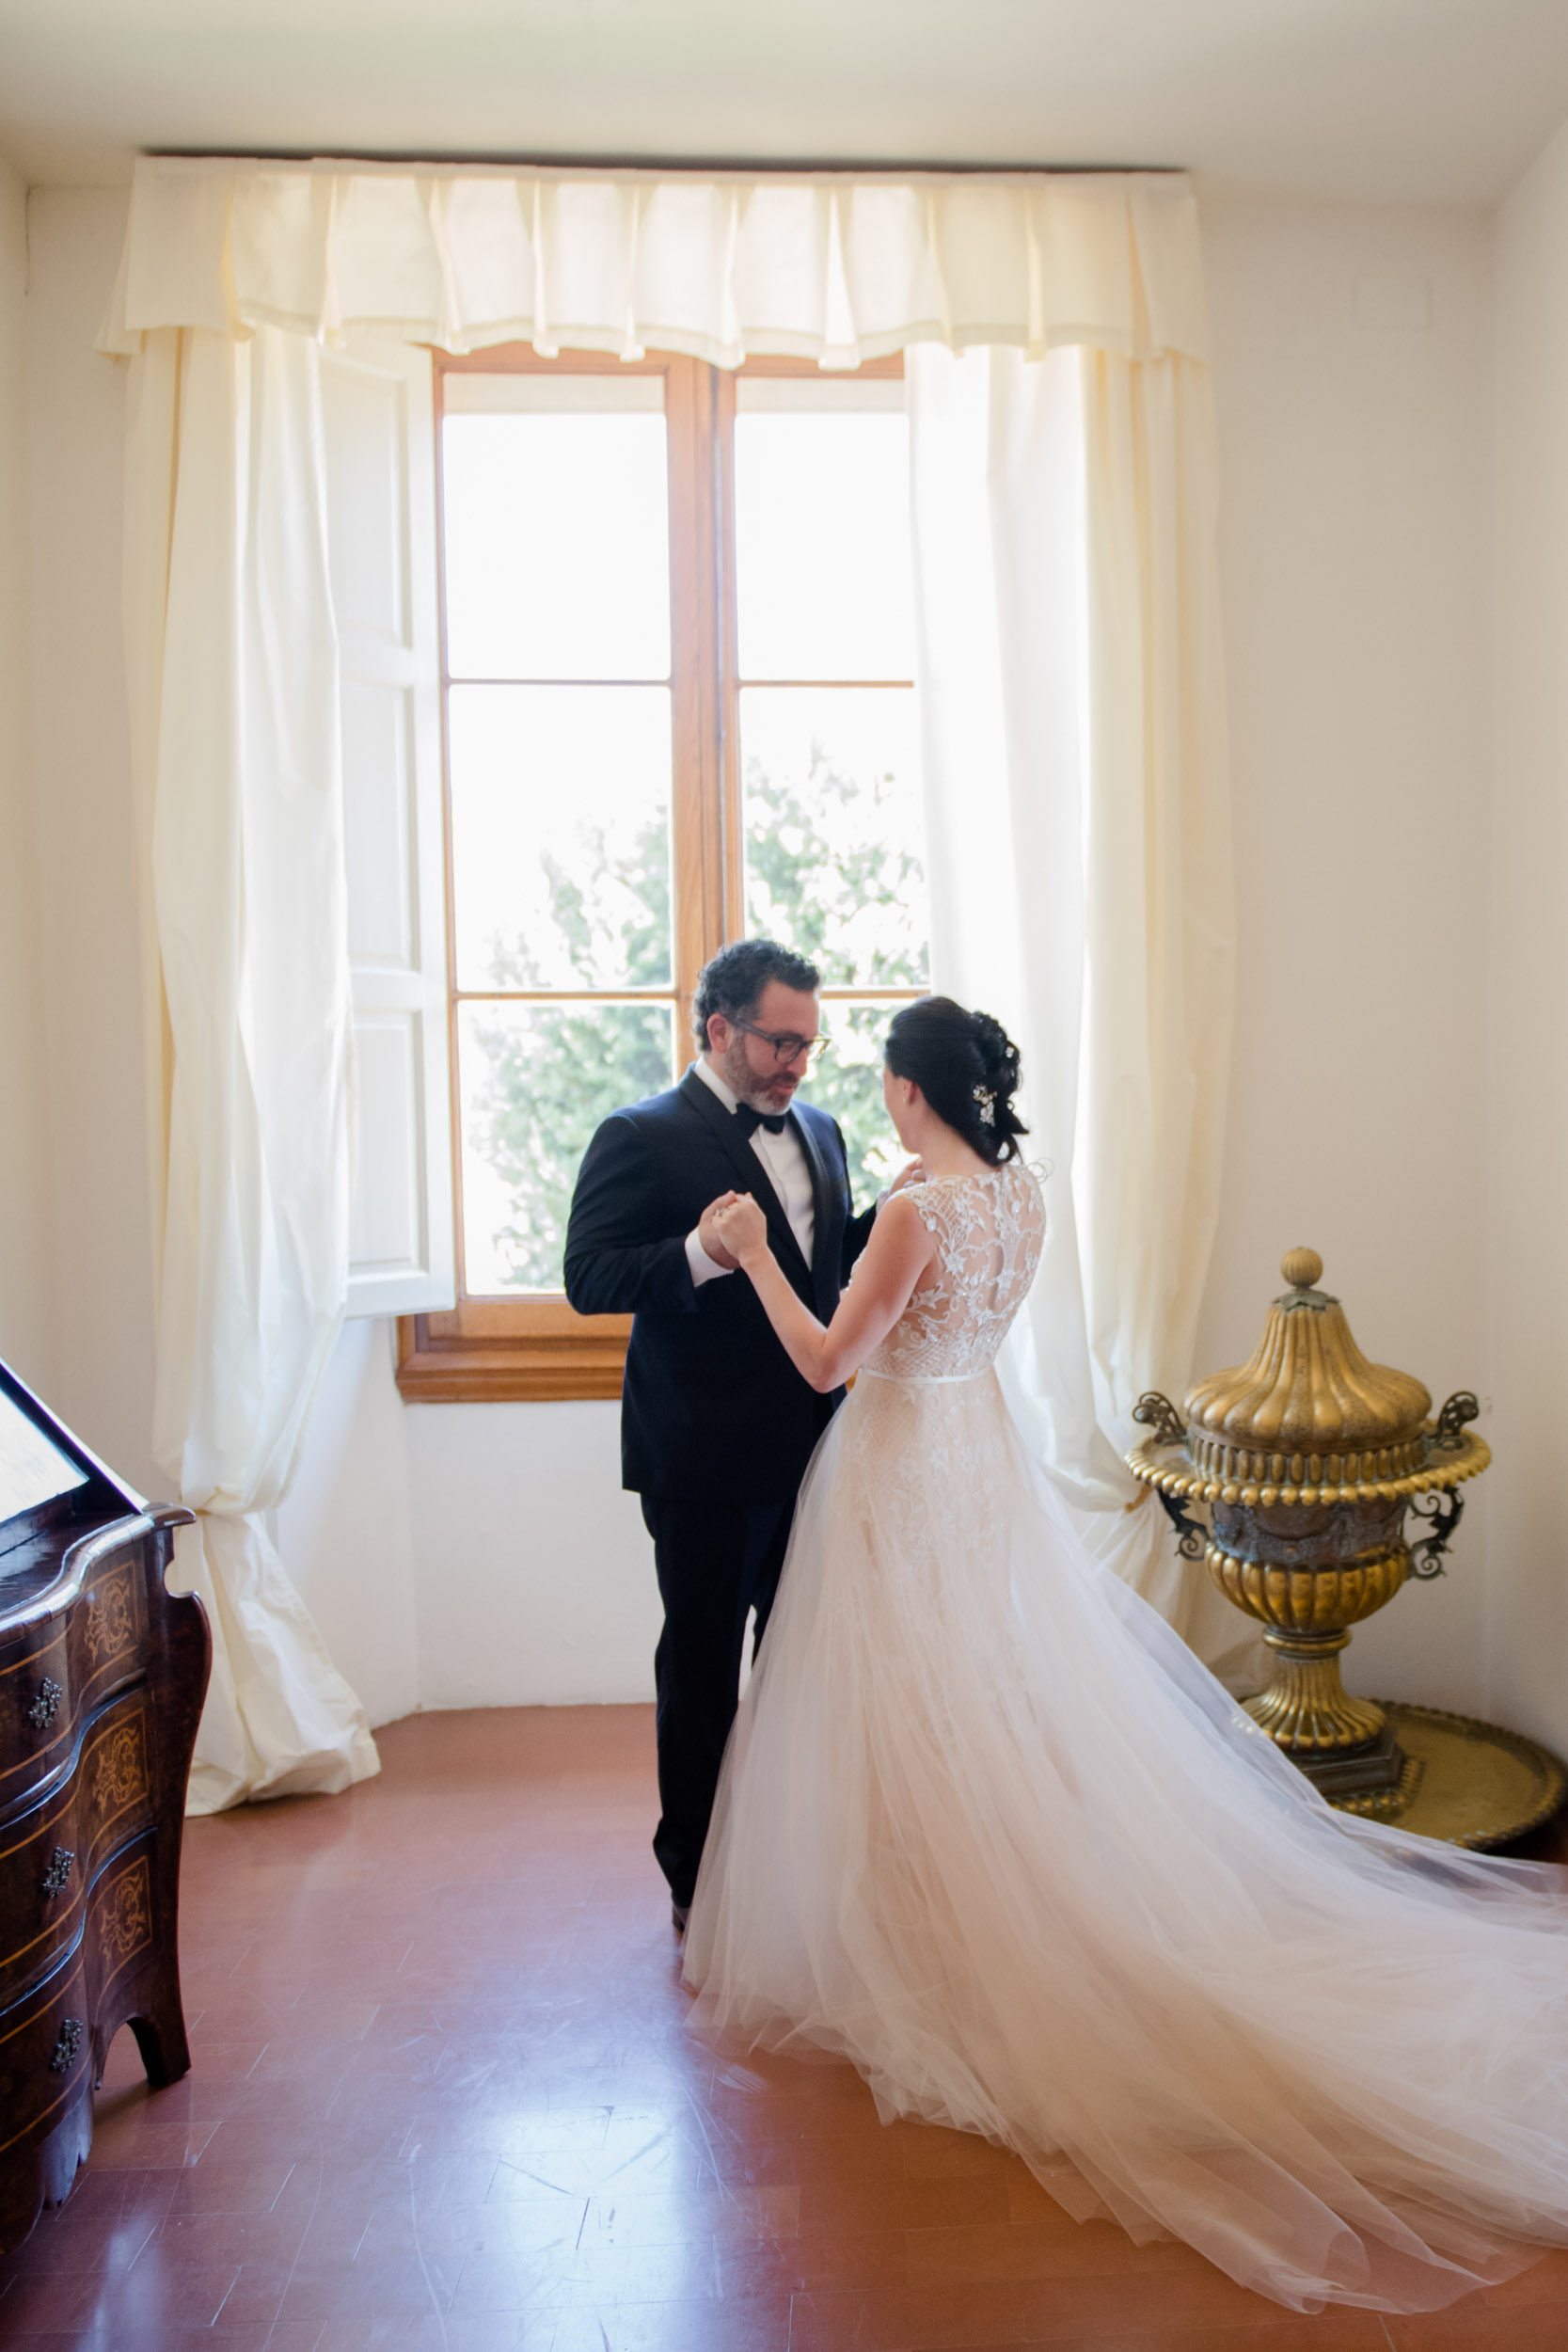 villa-gamberaia-florence-italy-destination-wedding-16.jpg